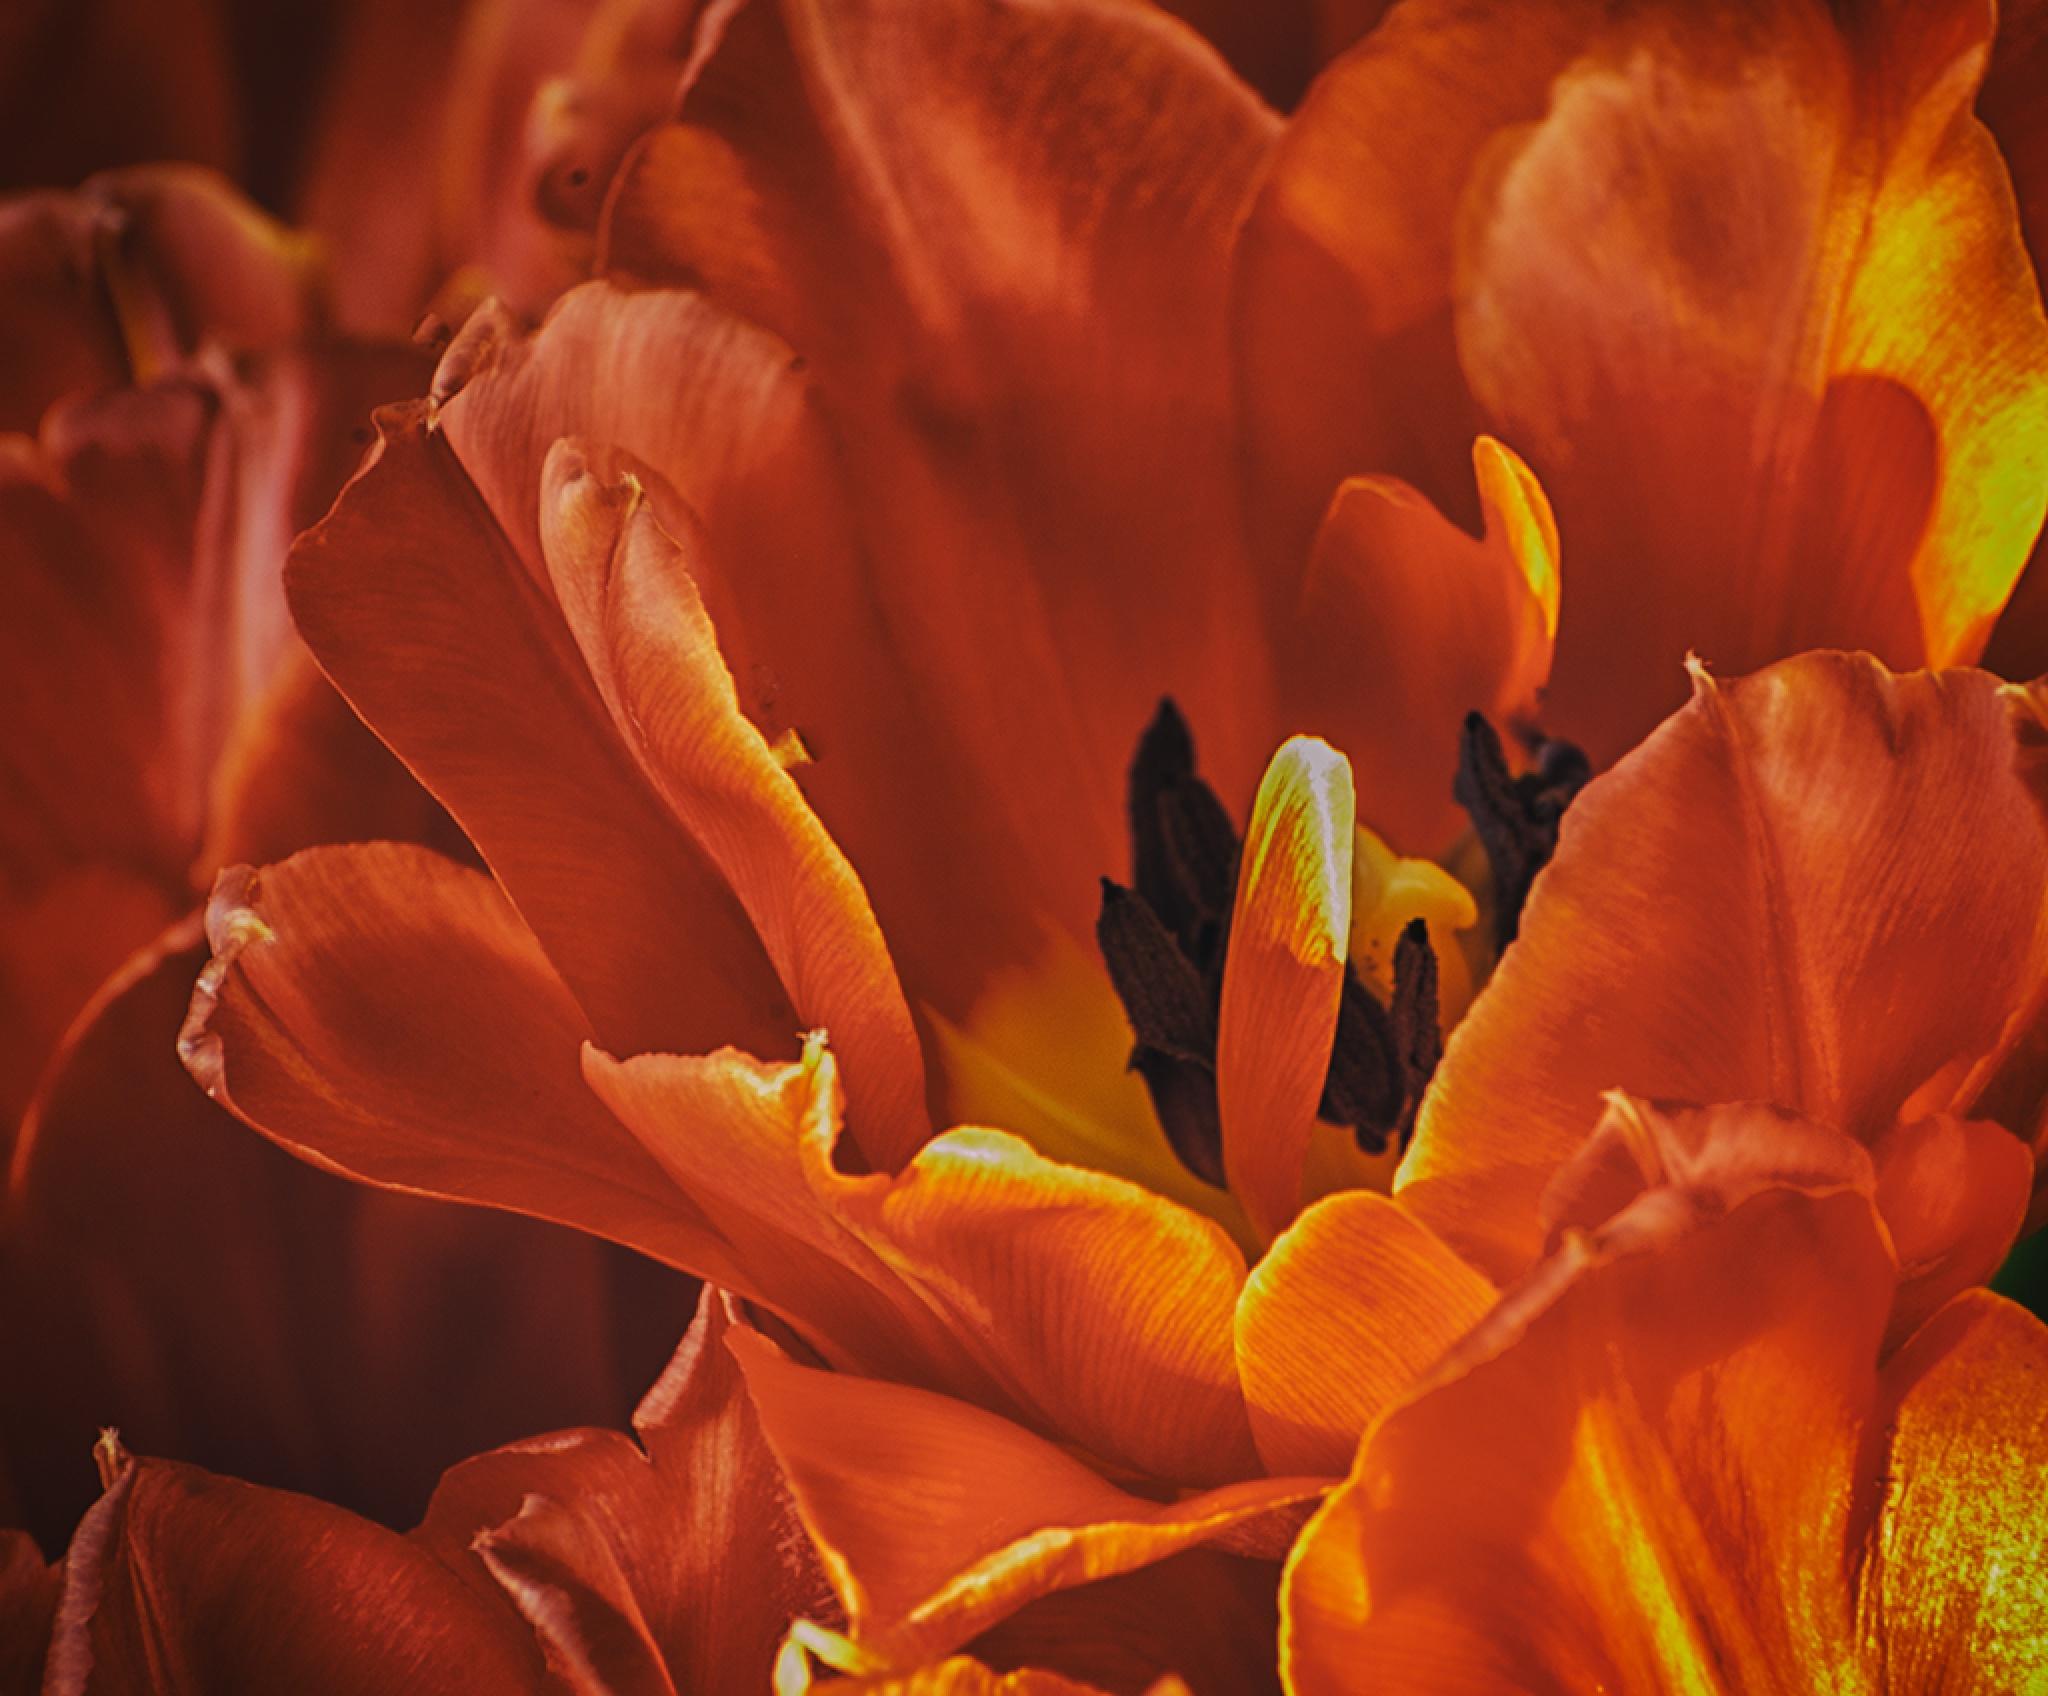 Flower by MargaretaG